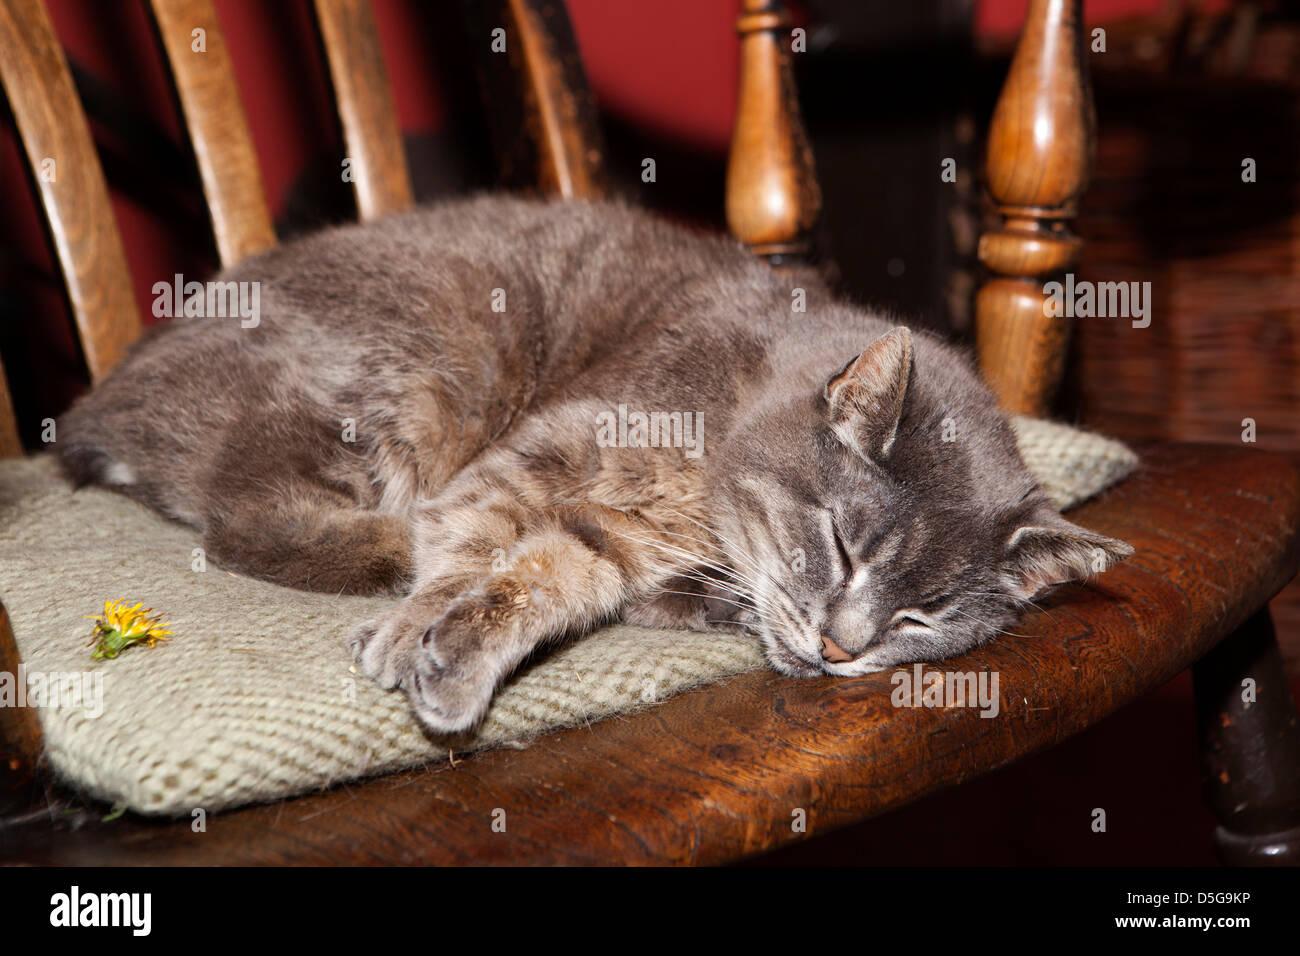 Isle of Man, Cregneash, Manx Heritage village folk museum, Manx cat asleep on chair - Stock Image